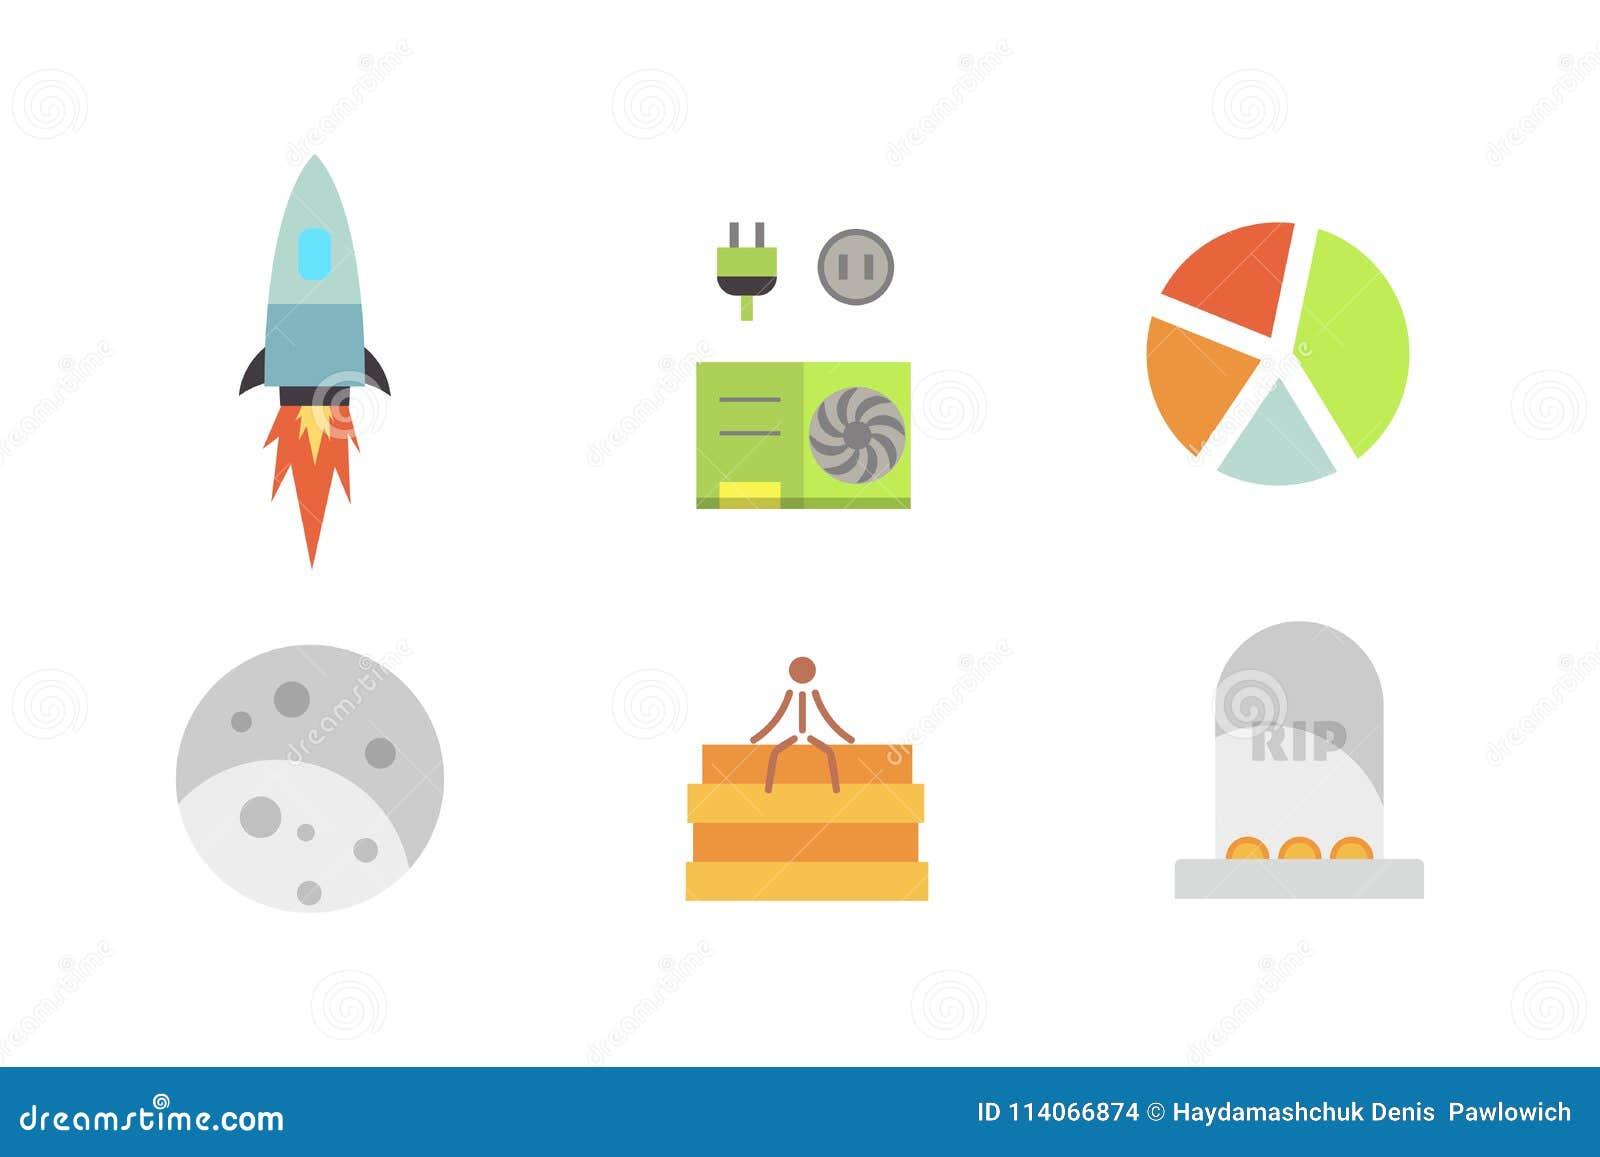 Token ICO Vector Illustration And Blockchain Technology Icons  Stock